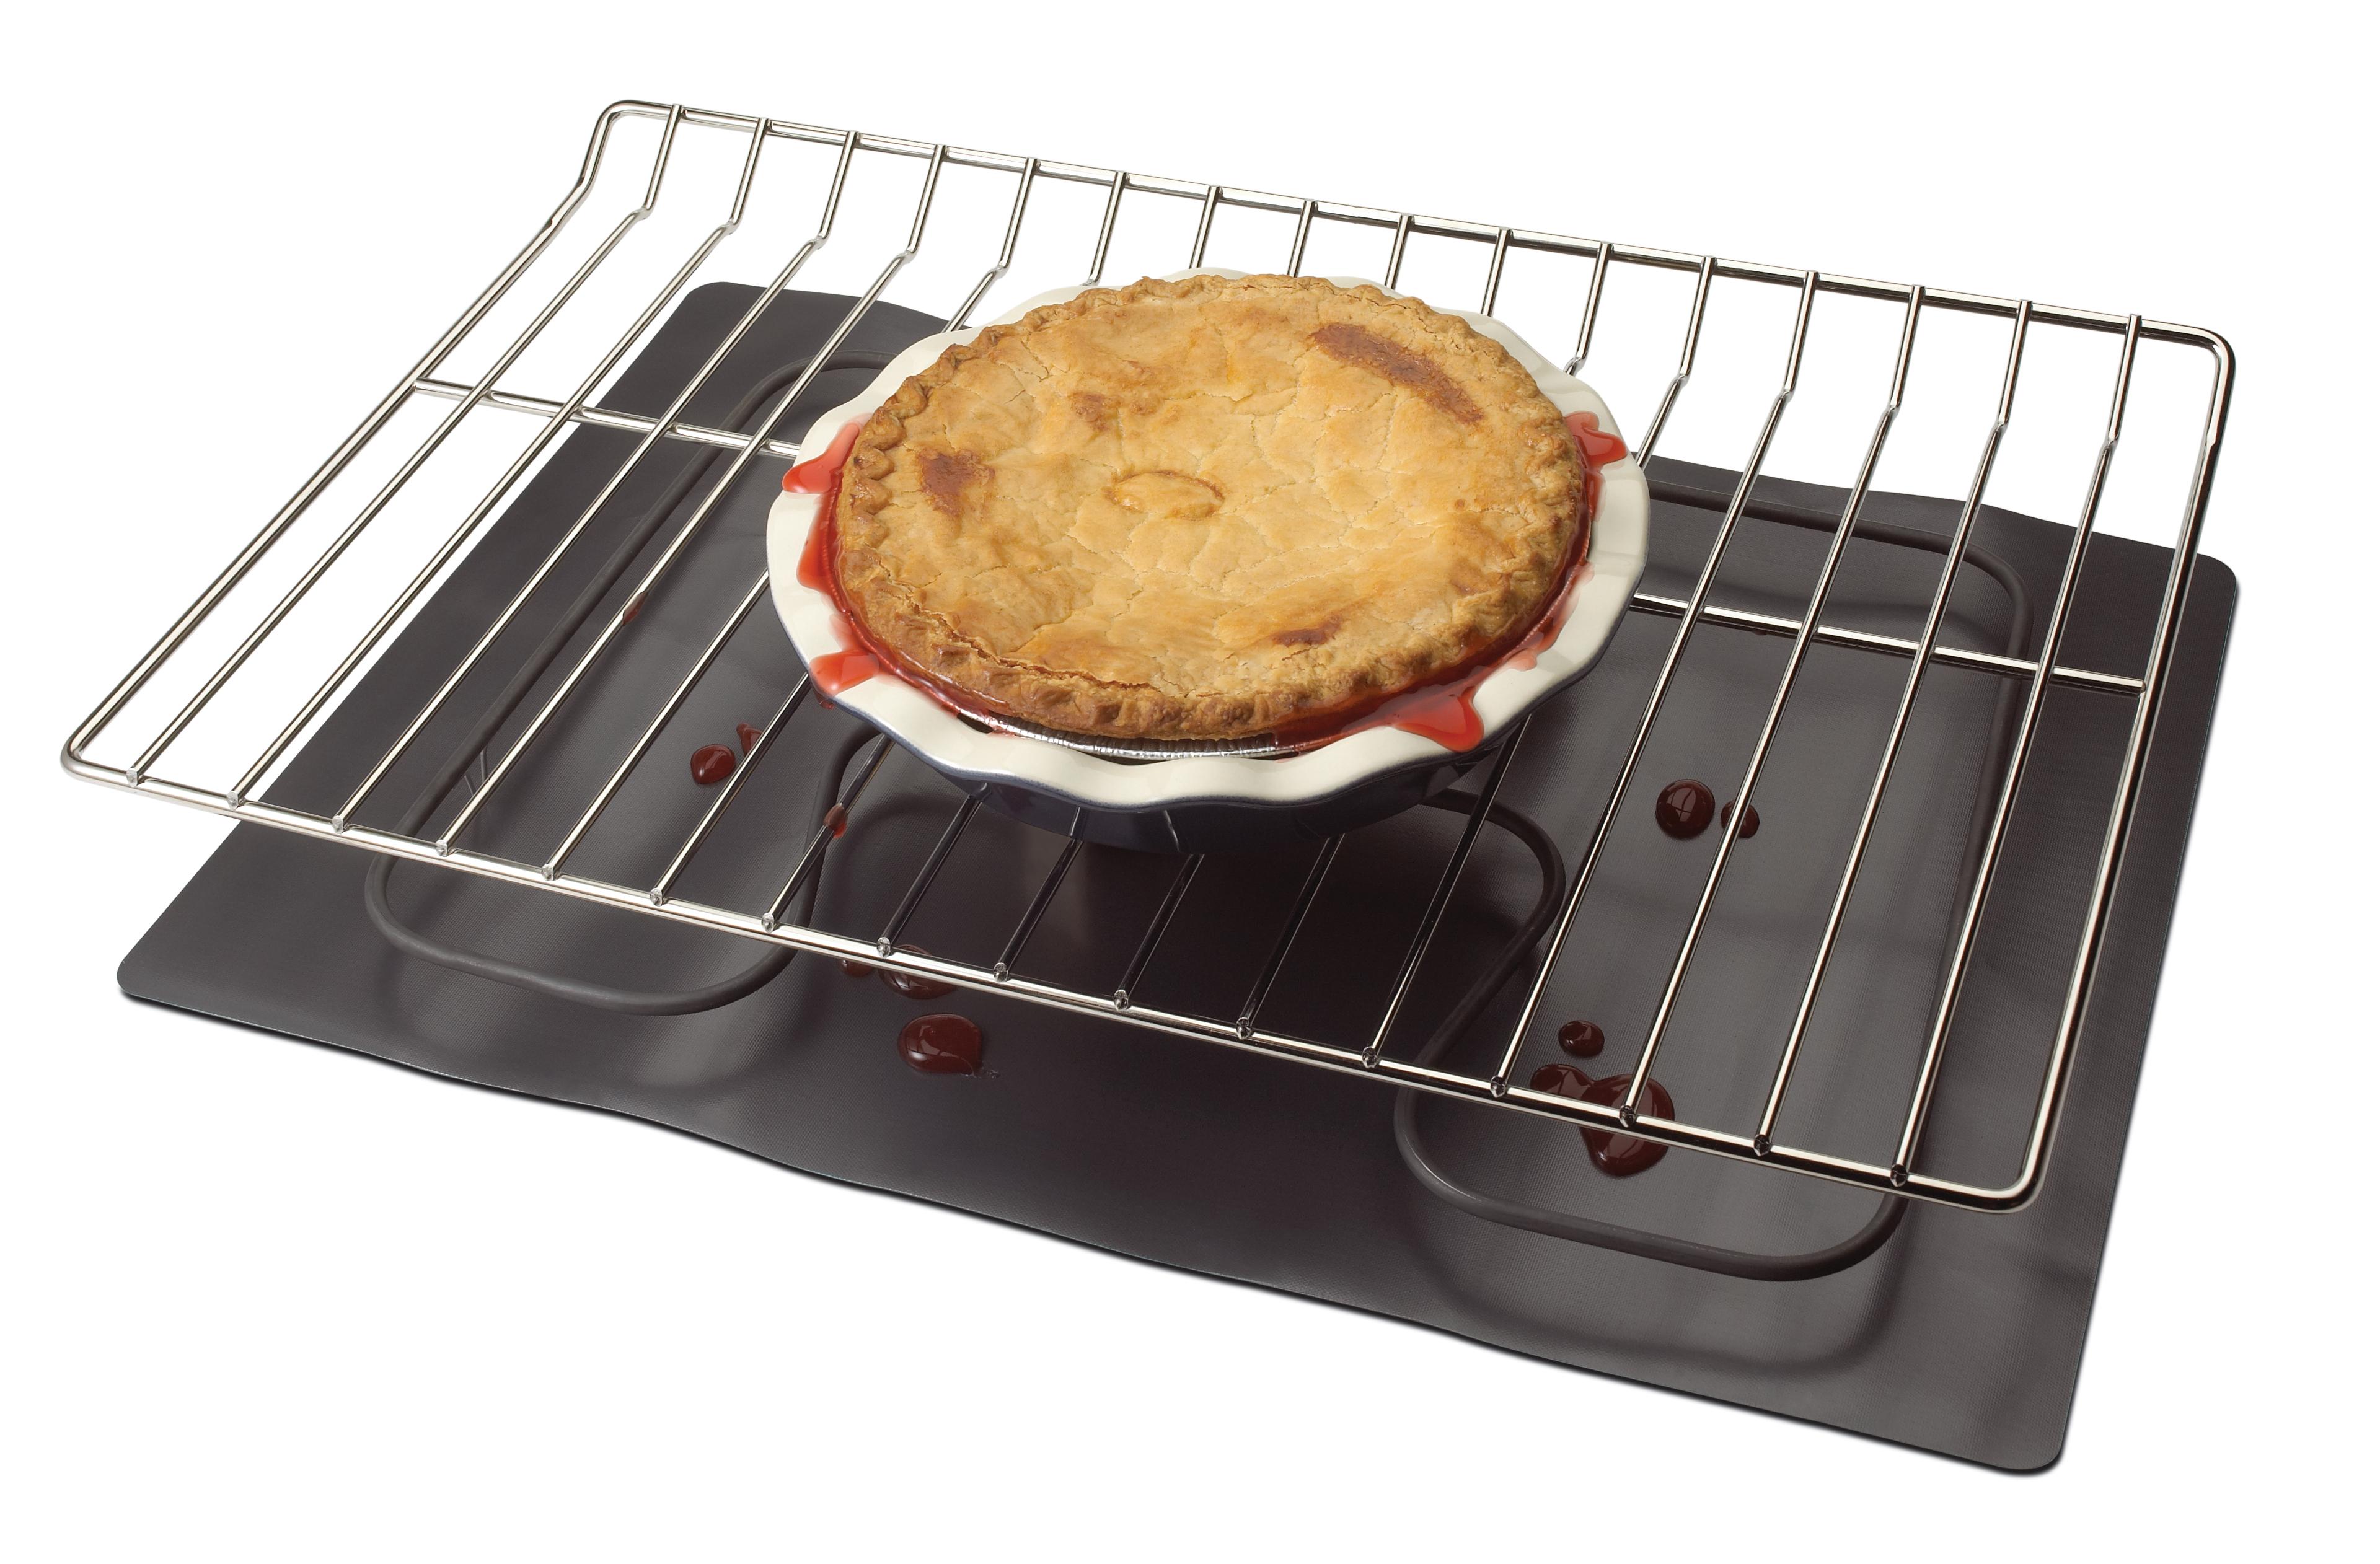 Chef's Planet Nonstick Ovenliner Commercial Grade